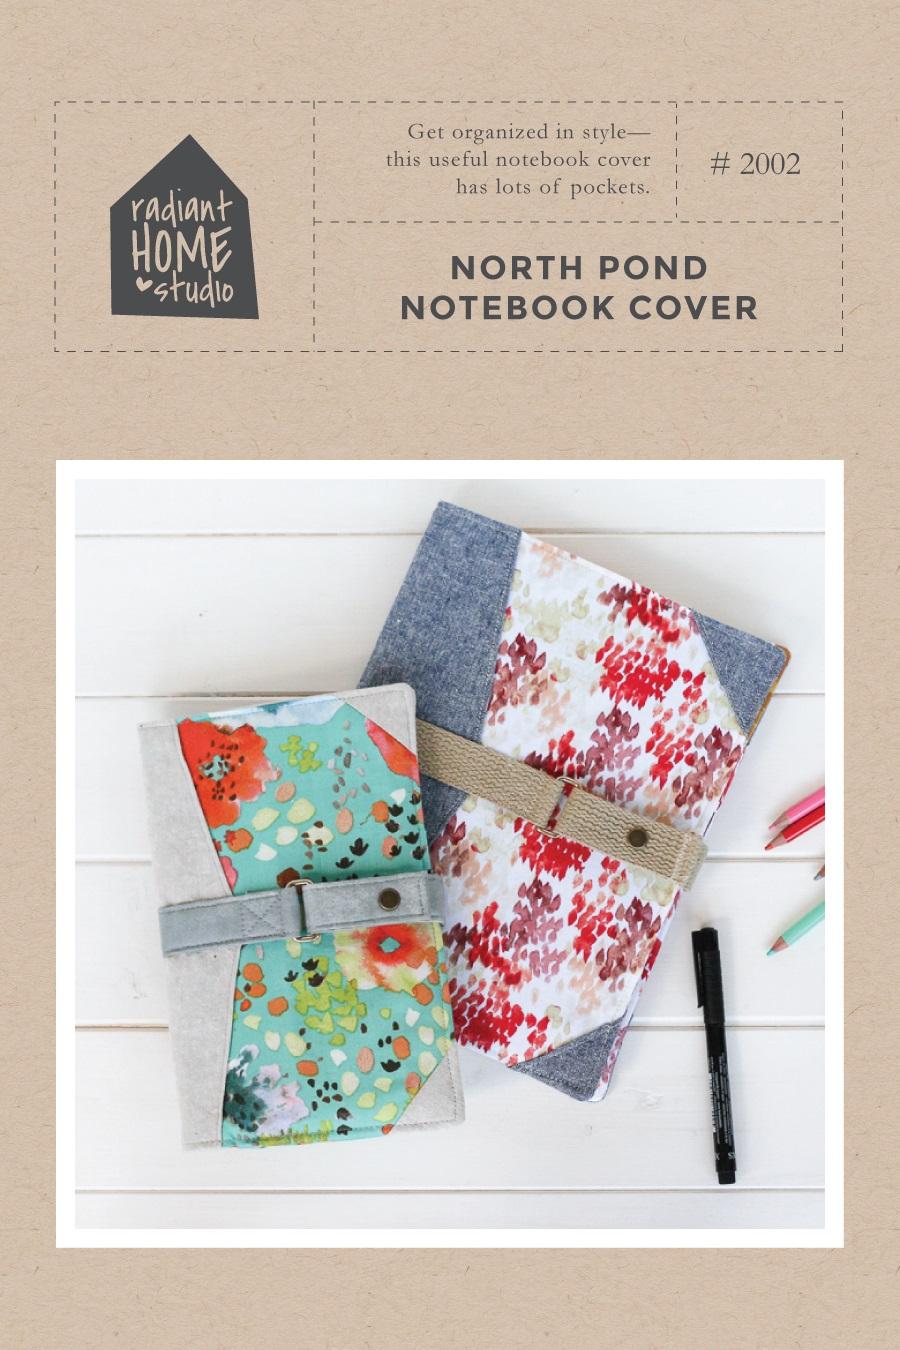 Radiant Home Studio - North Pond Notebook by Sara.jpg